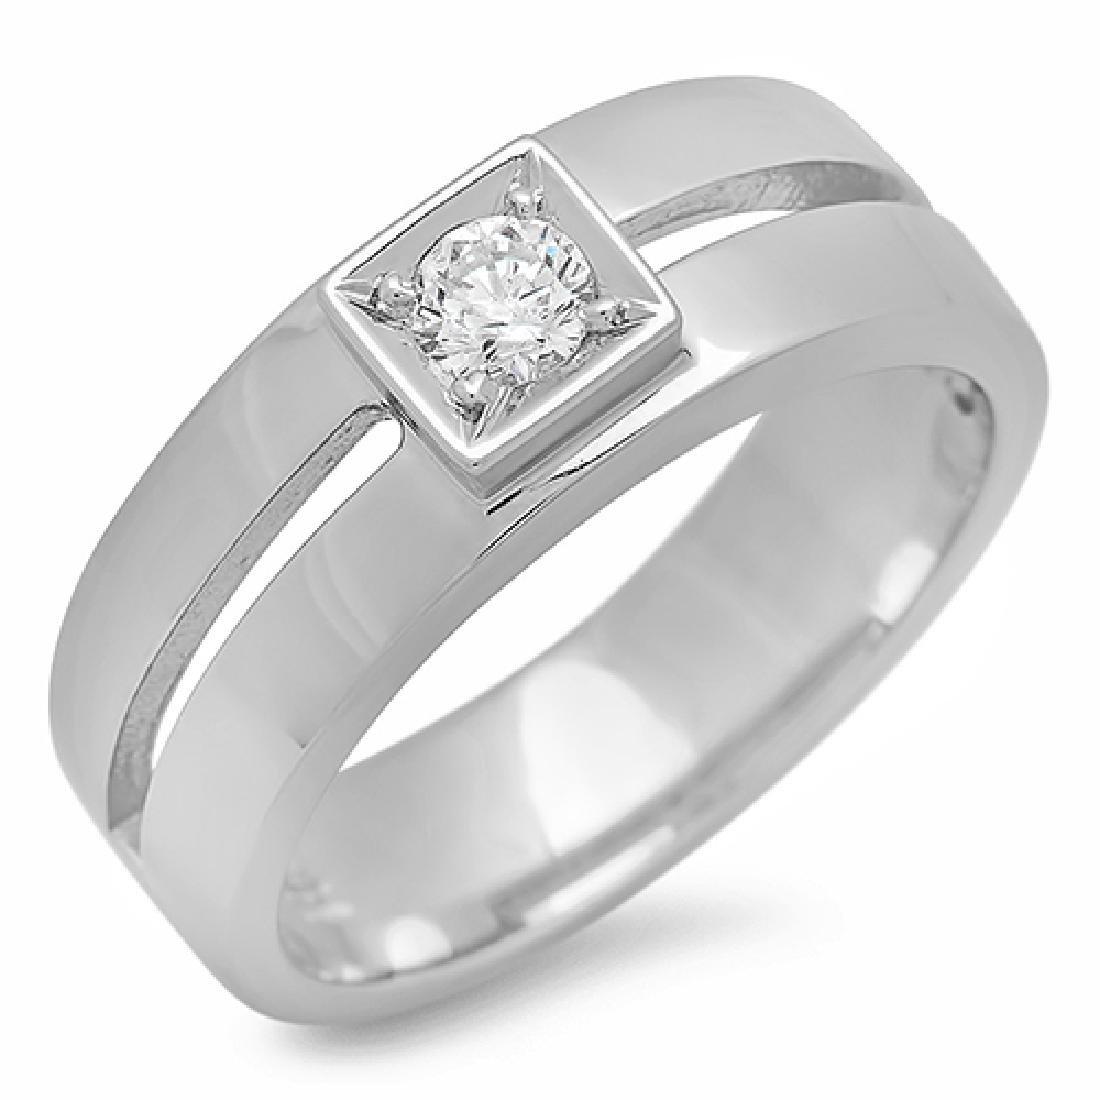 Mens 0.24 Carat Natural Diamond 18K Solid White Gold - 2